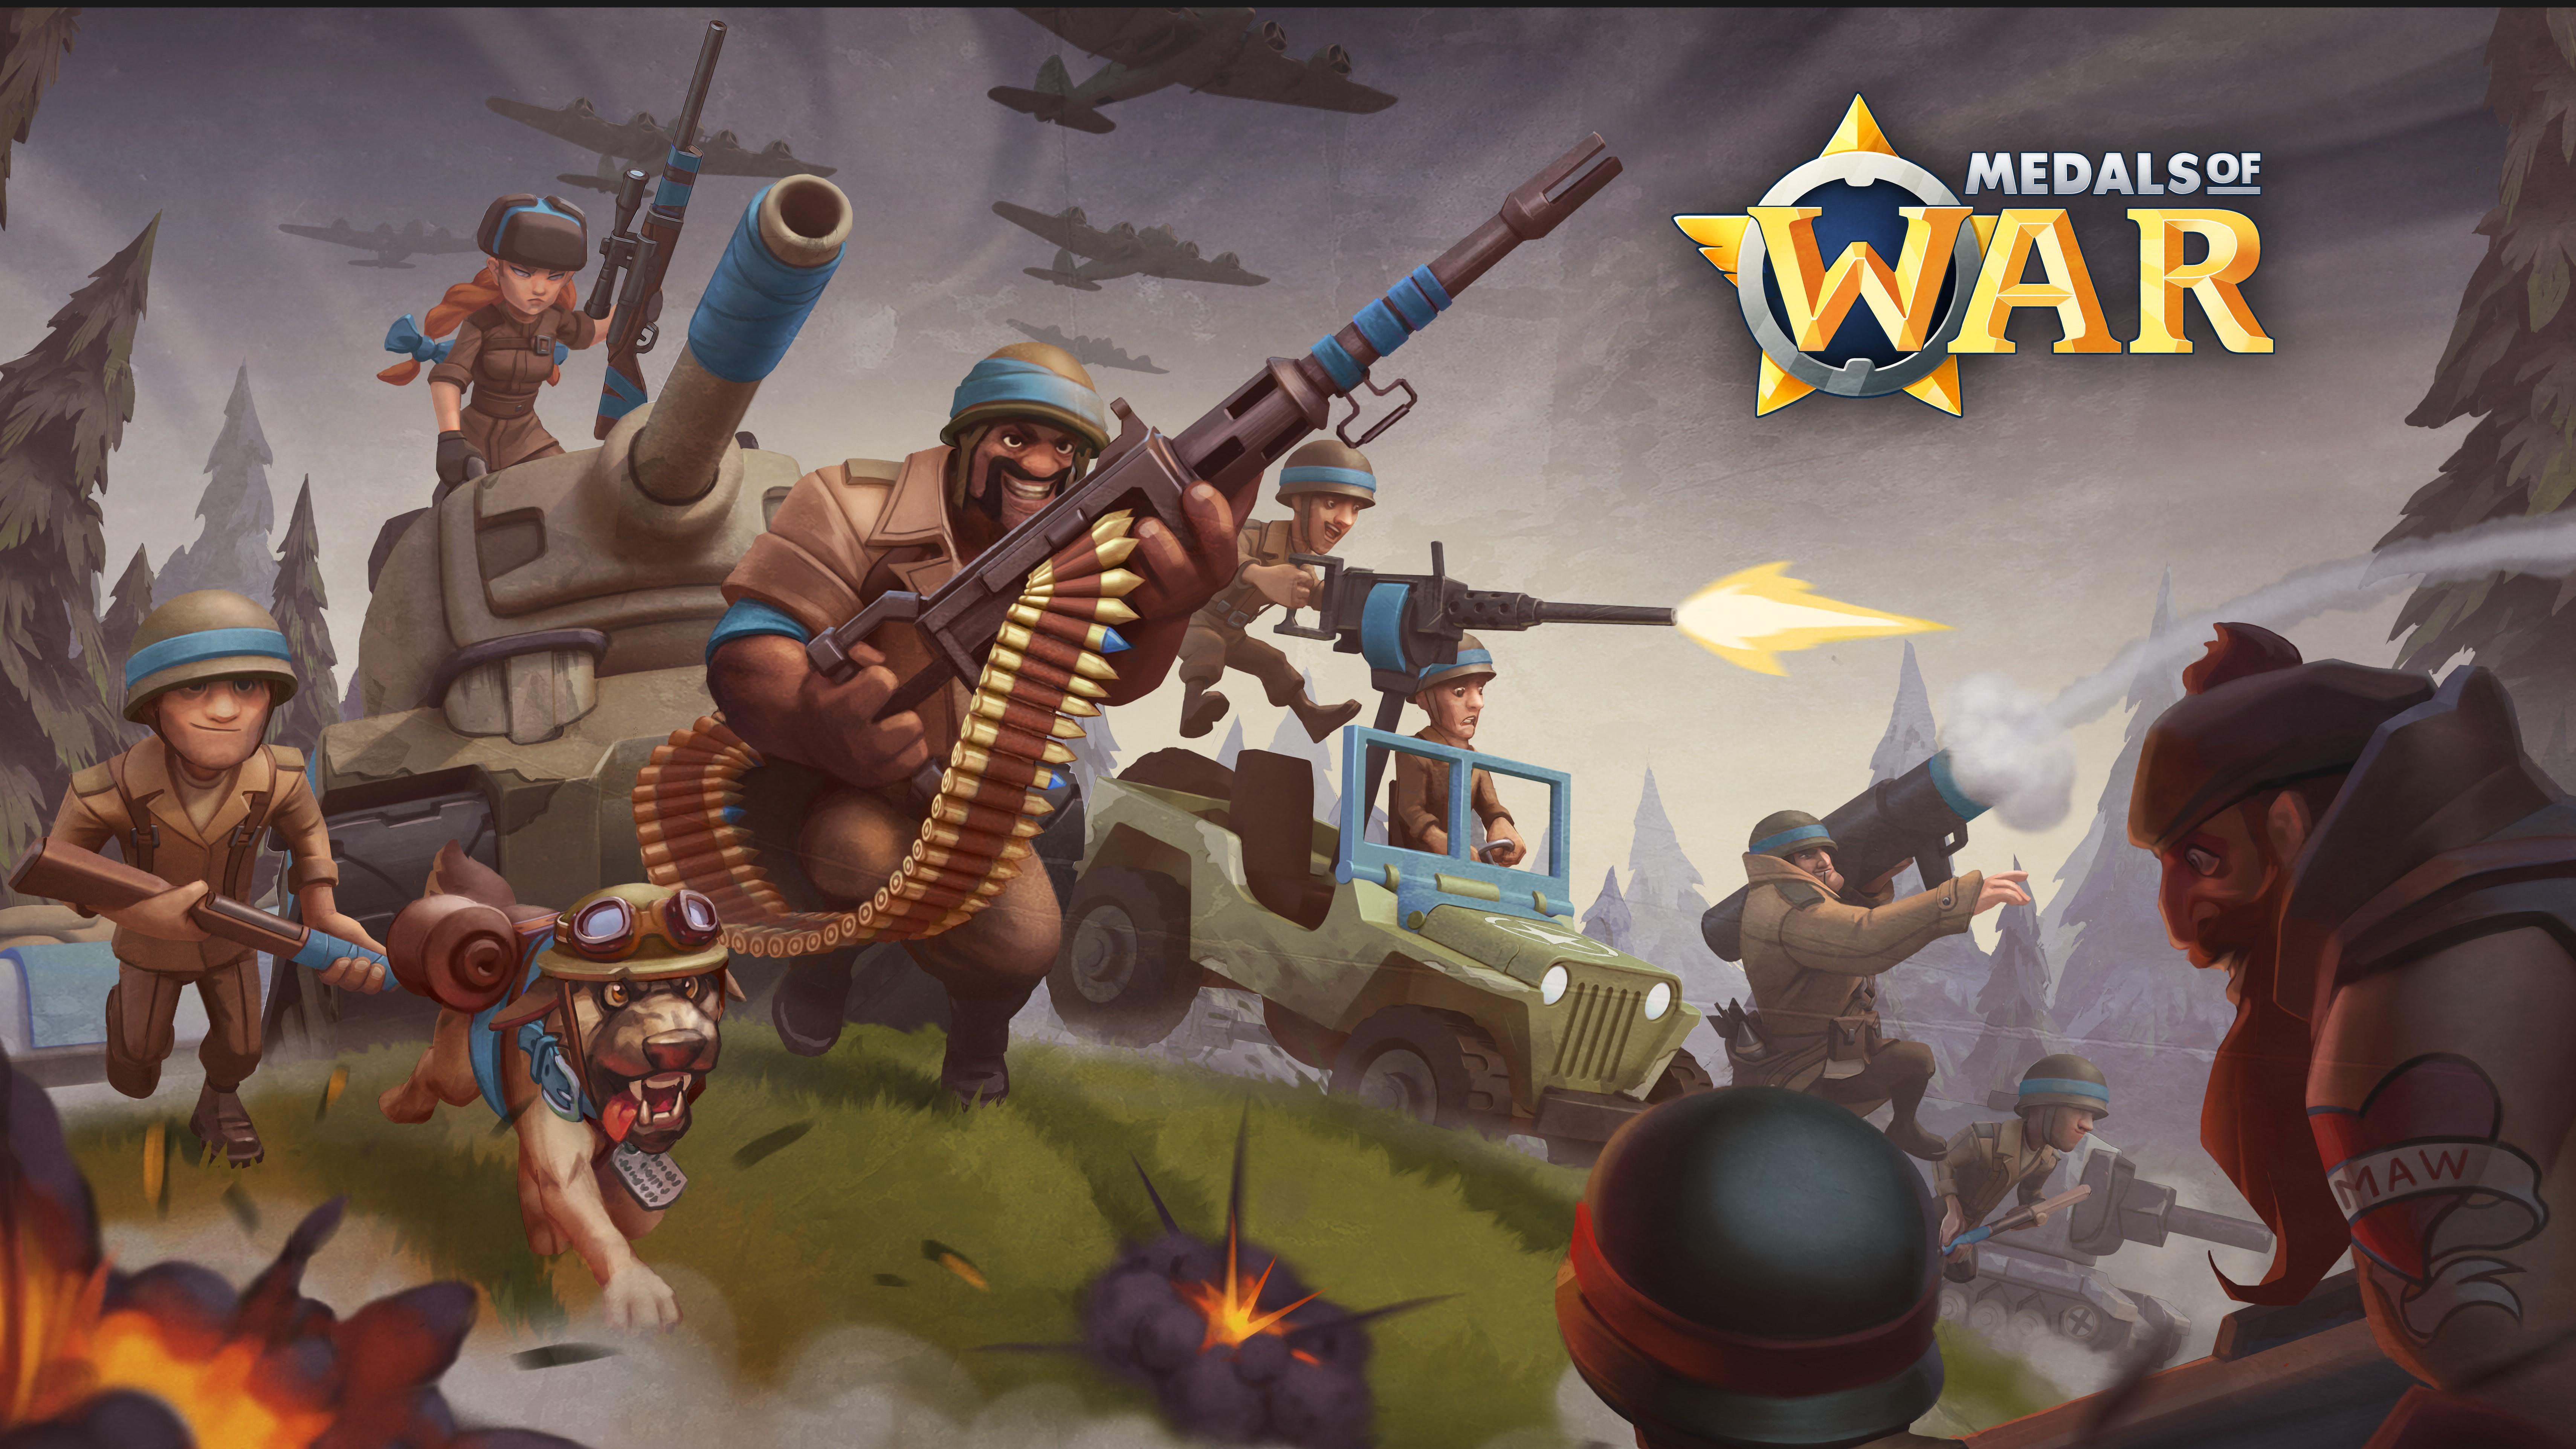 Breakit - Nitro Games launches Medals of War!